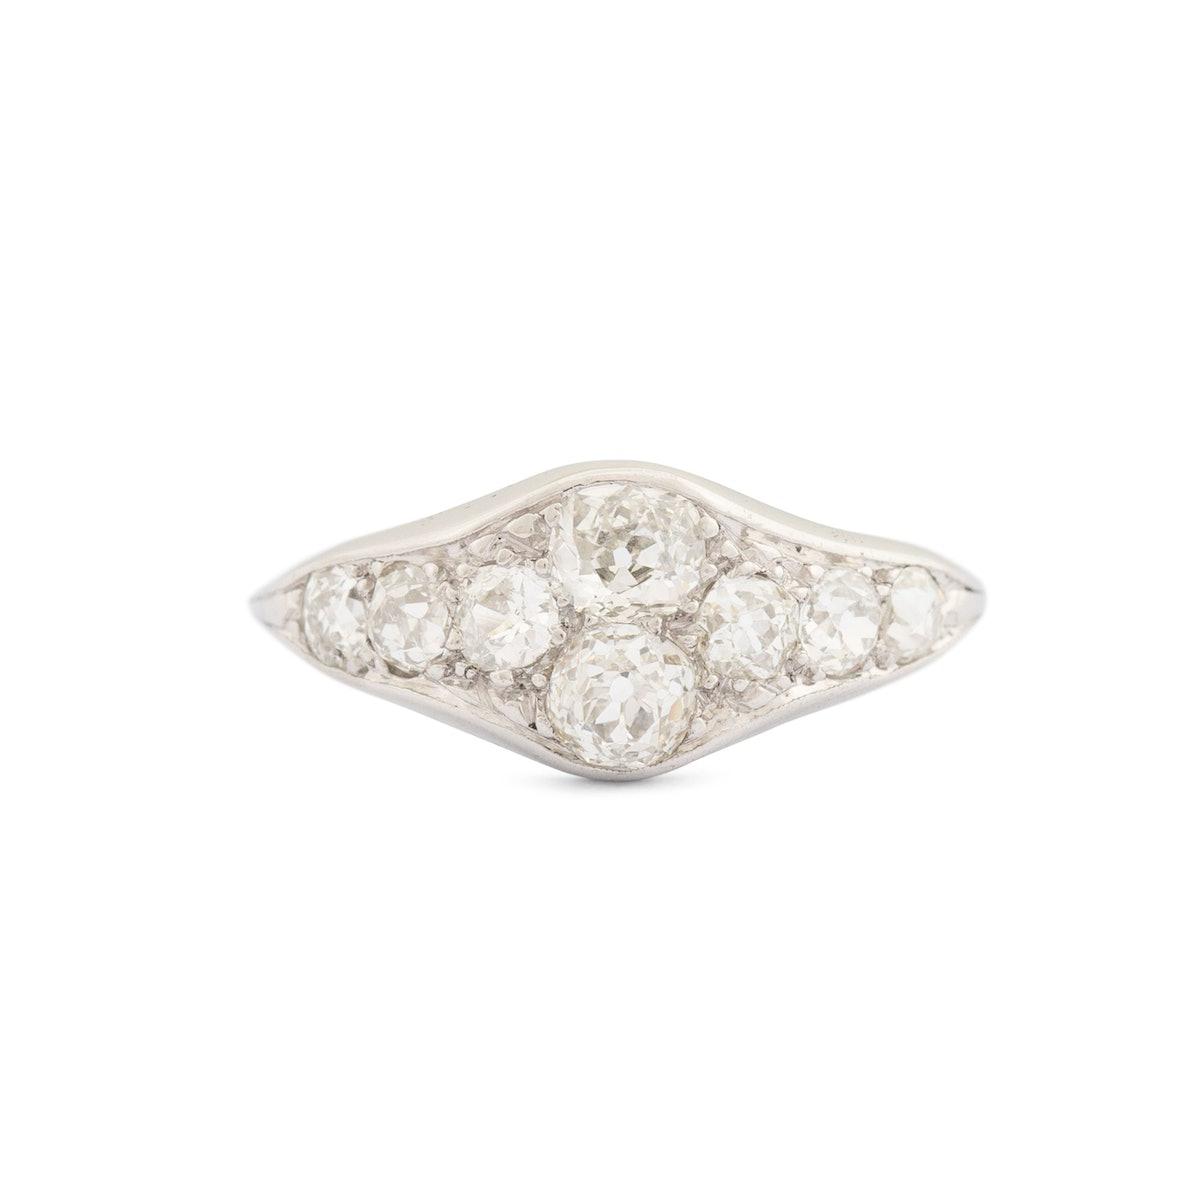 Art Deco Old Mine Cut Diamond And Platinum Ring